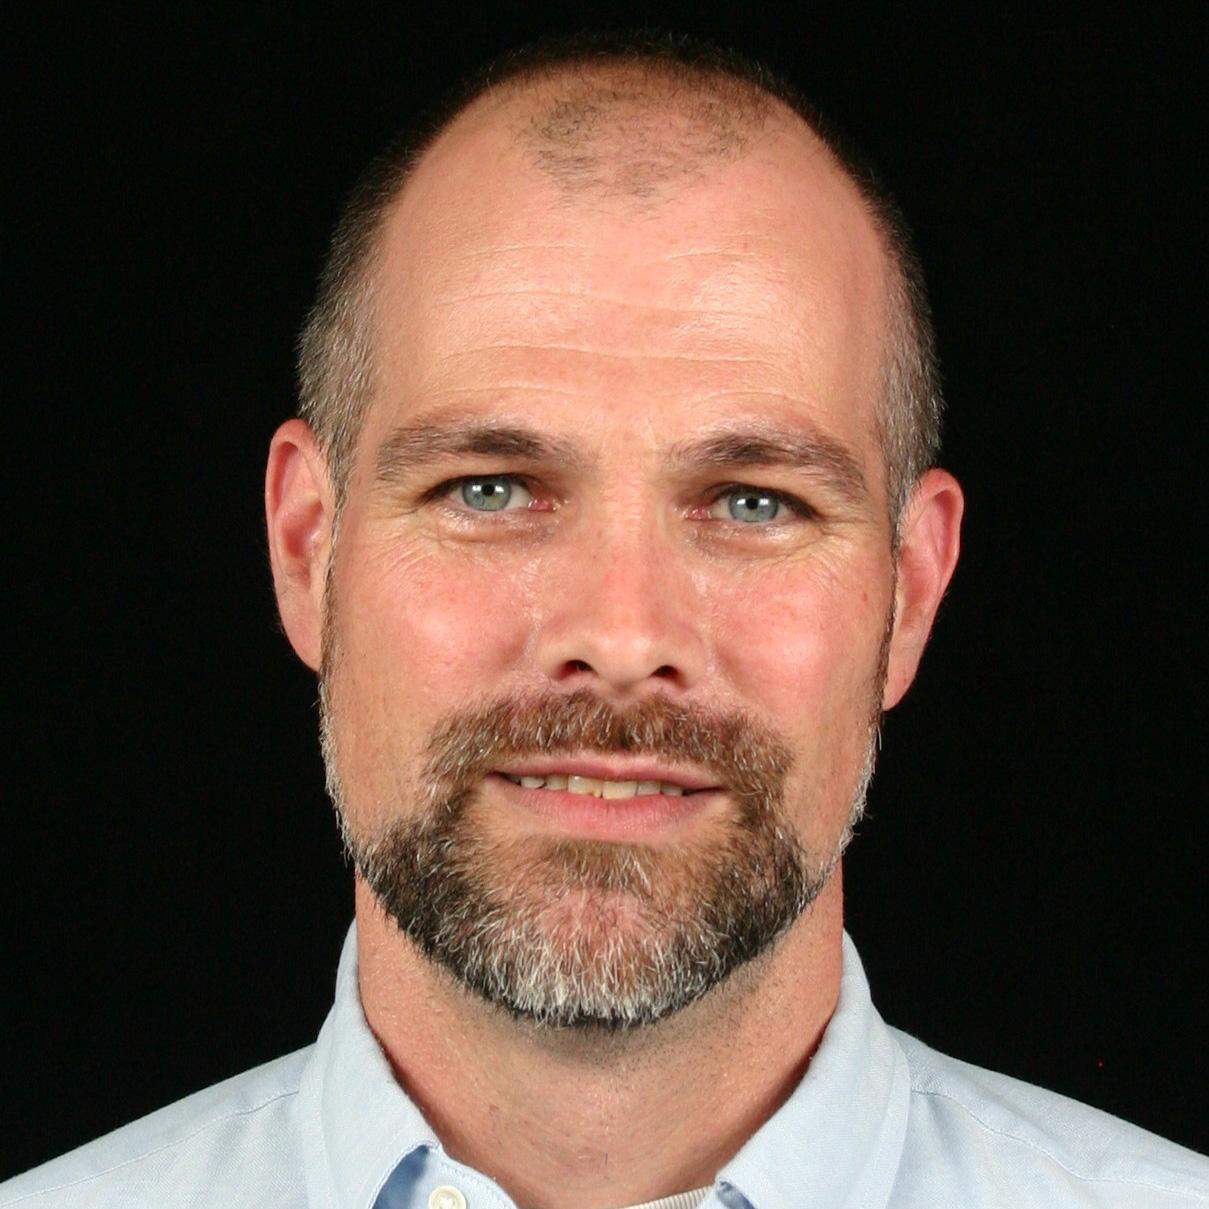 Dr Chris Main